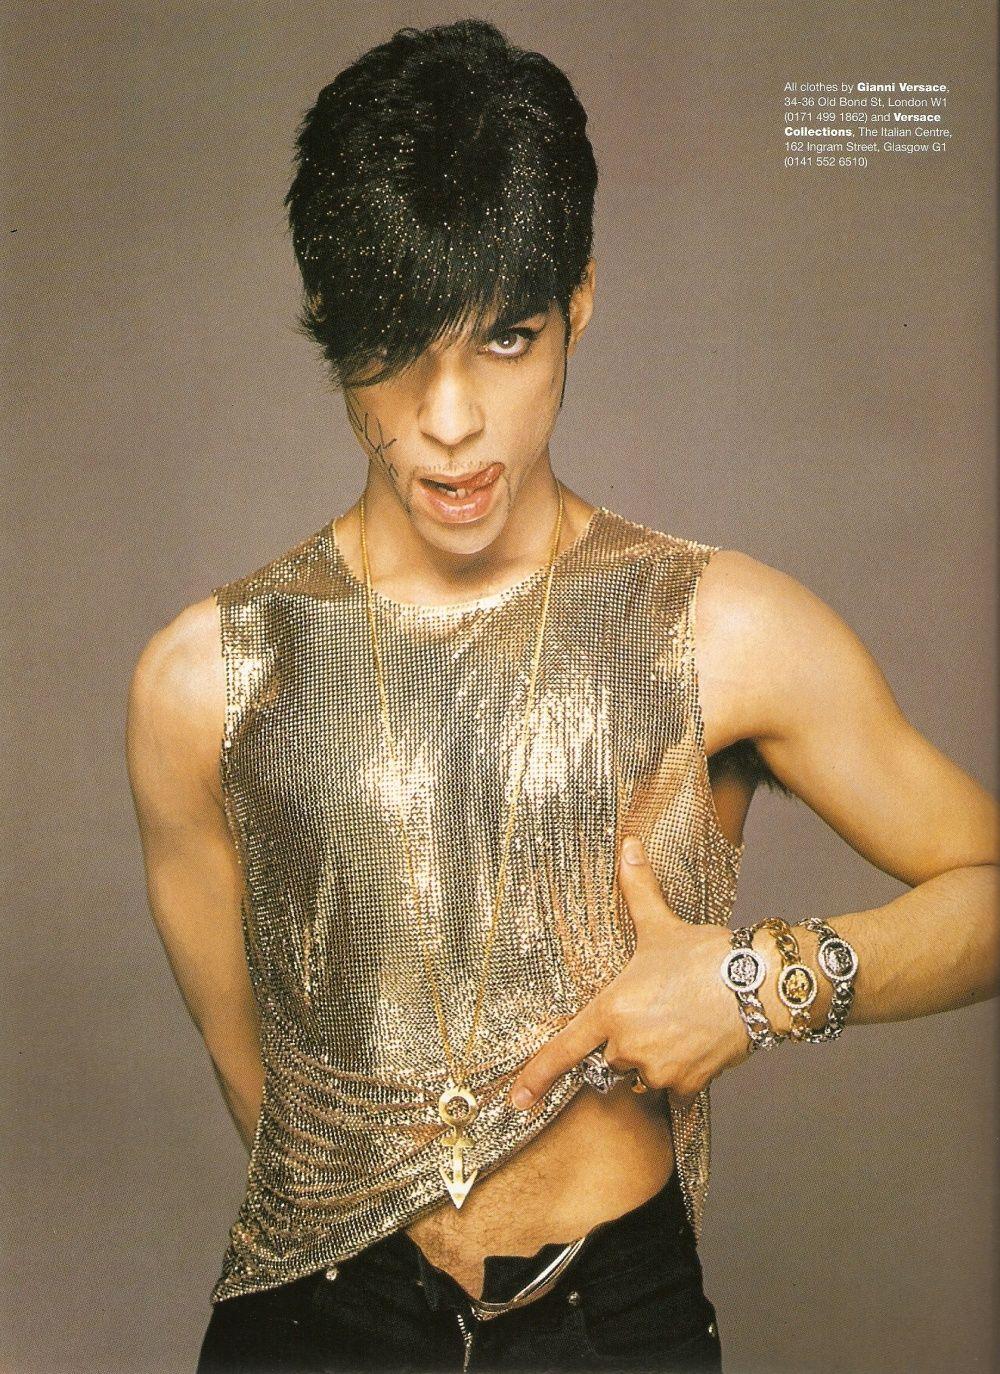 Versace 1995 - Prince by Richard Avedon